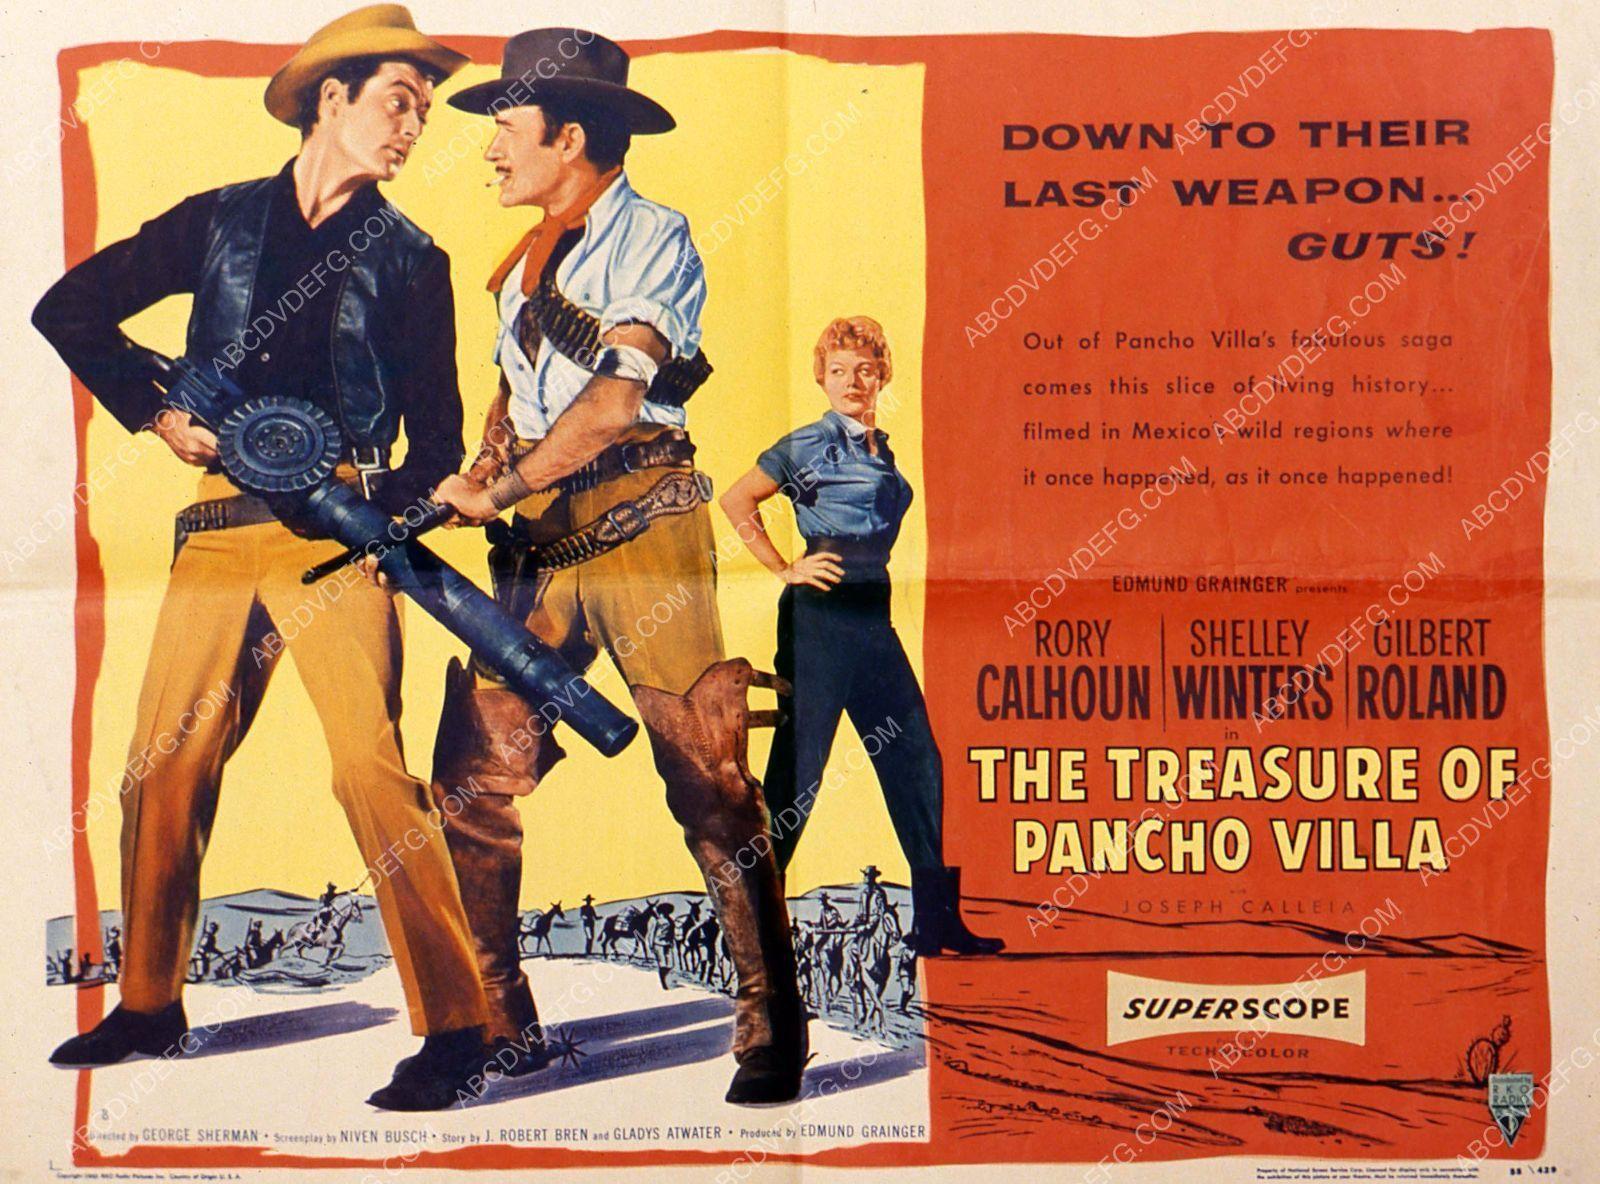 Rory Calhoun Gilbert Roland film The Treasure of Pancho Villa 35m-3647